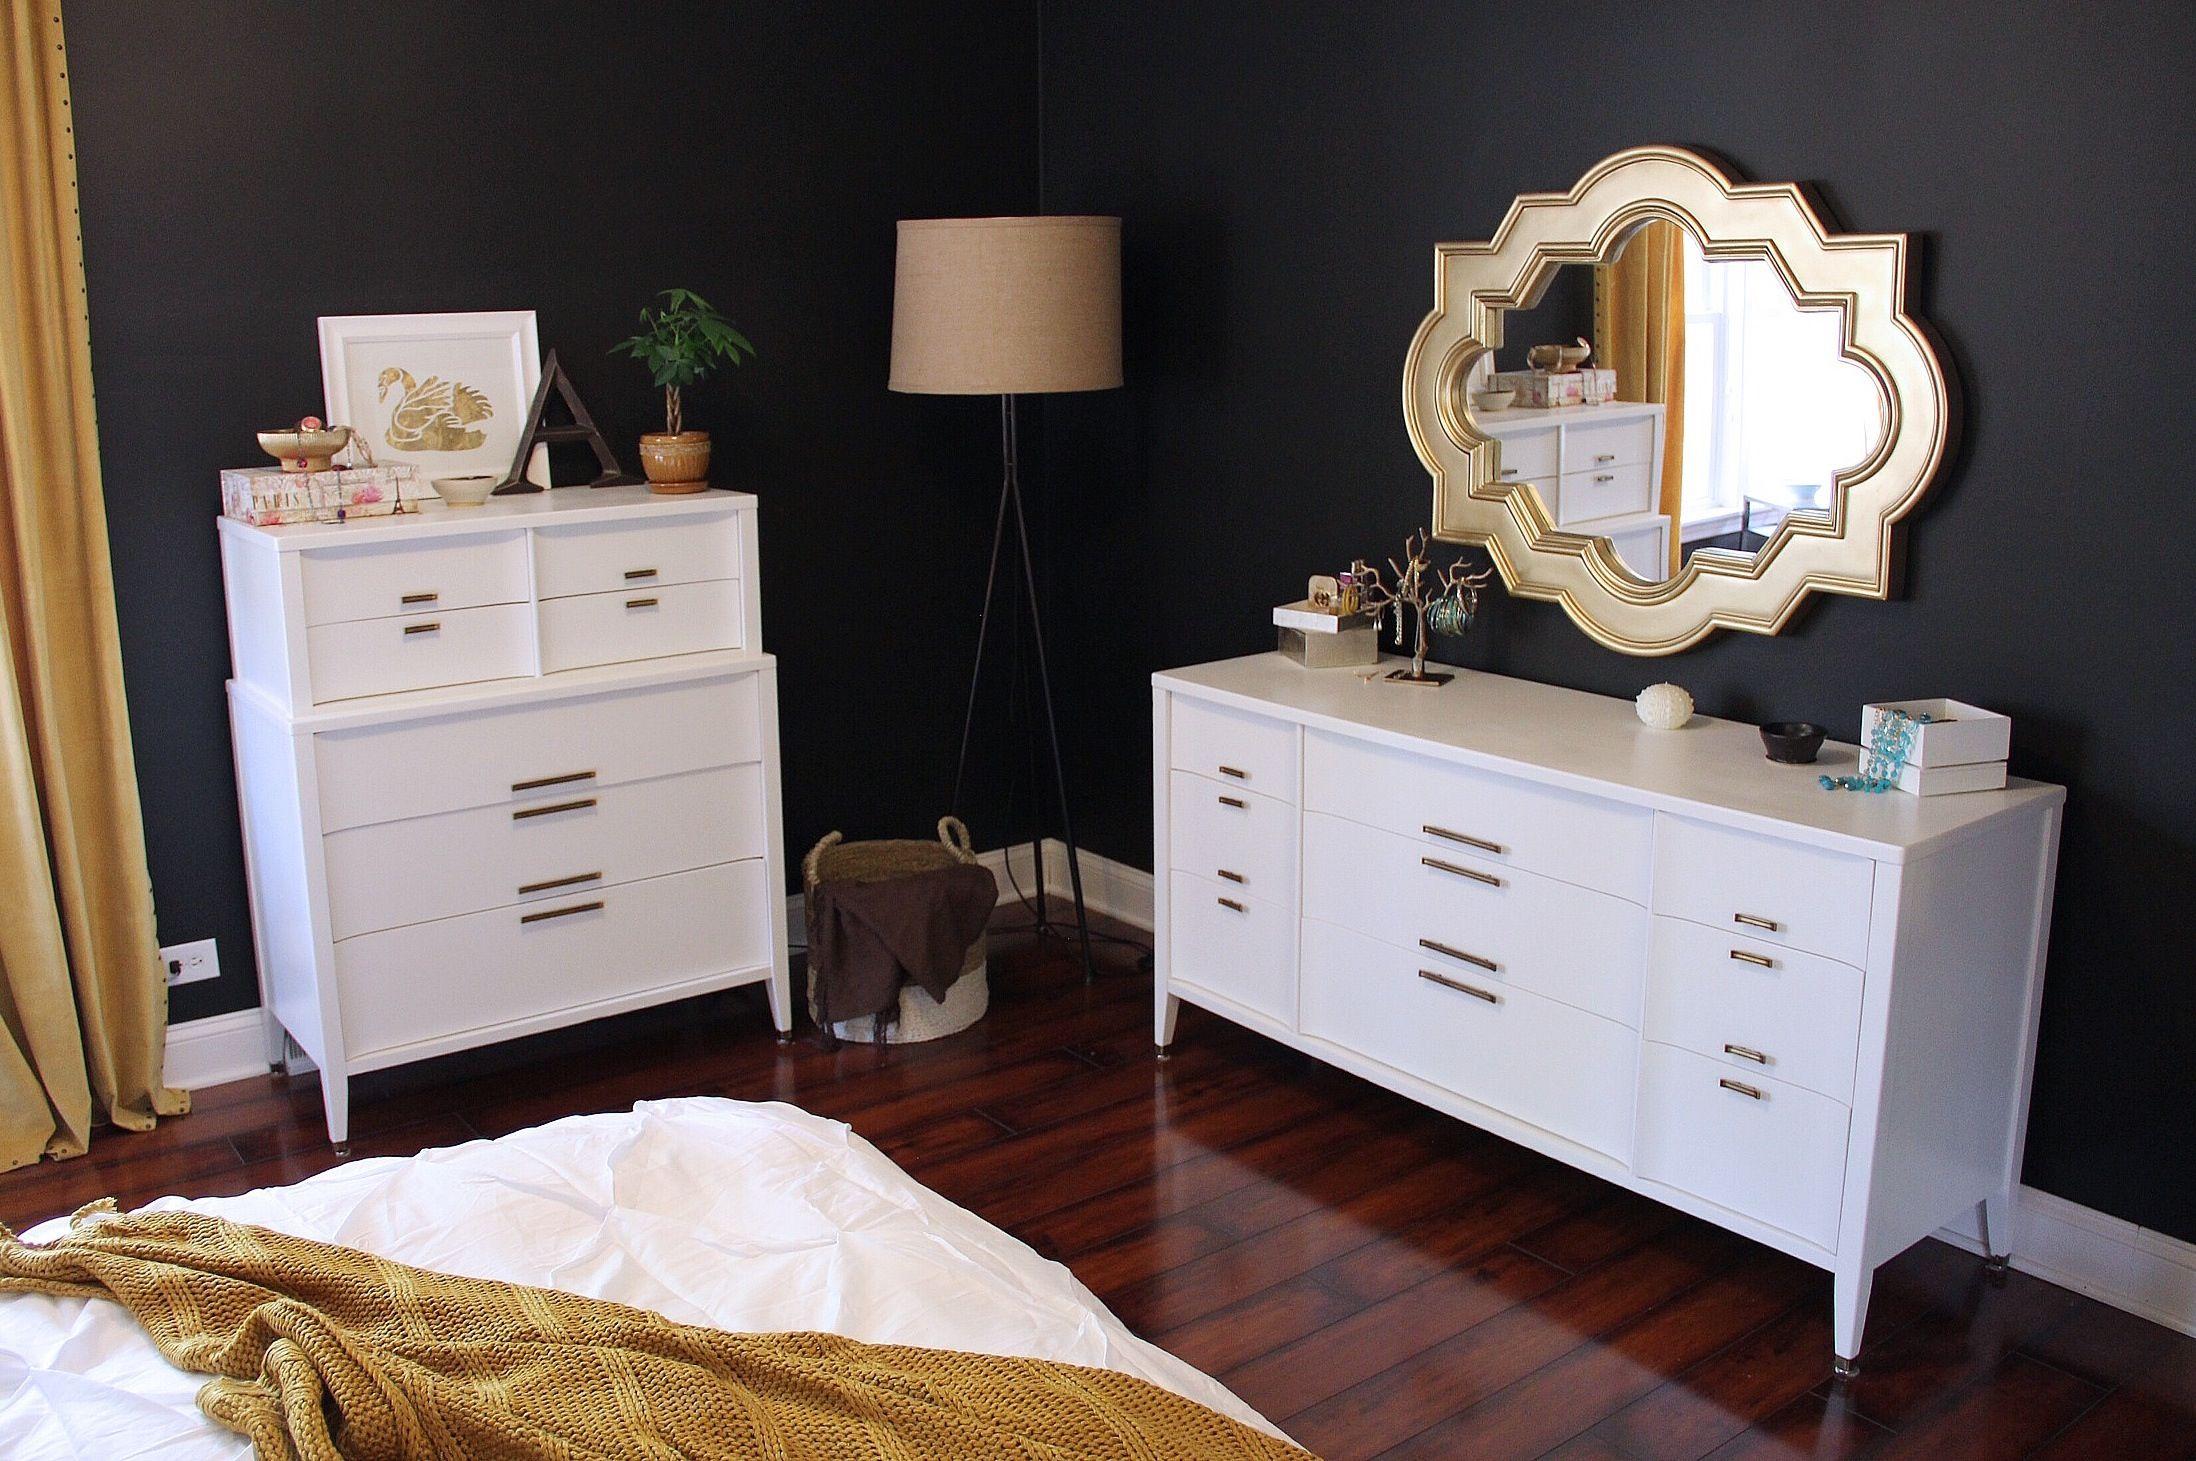 Modern Furniture Hawaii bedroom furniture. hi gloss white mid-century modern furniture